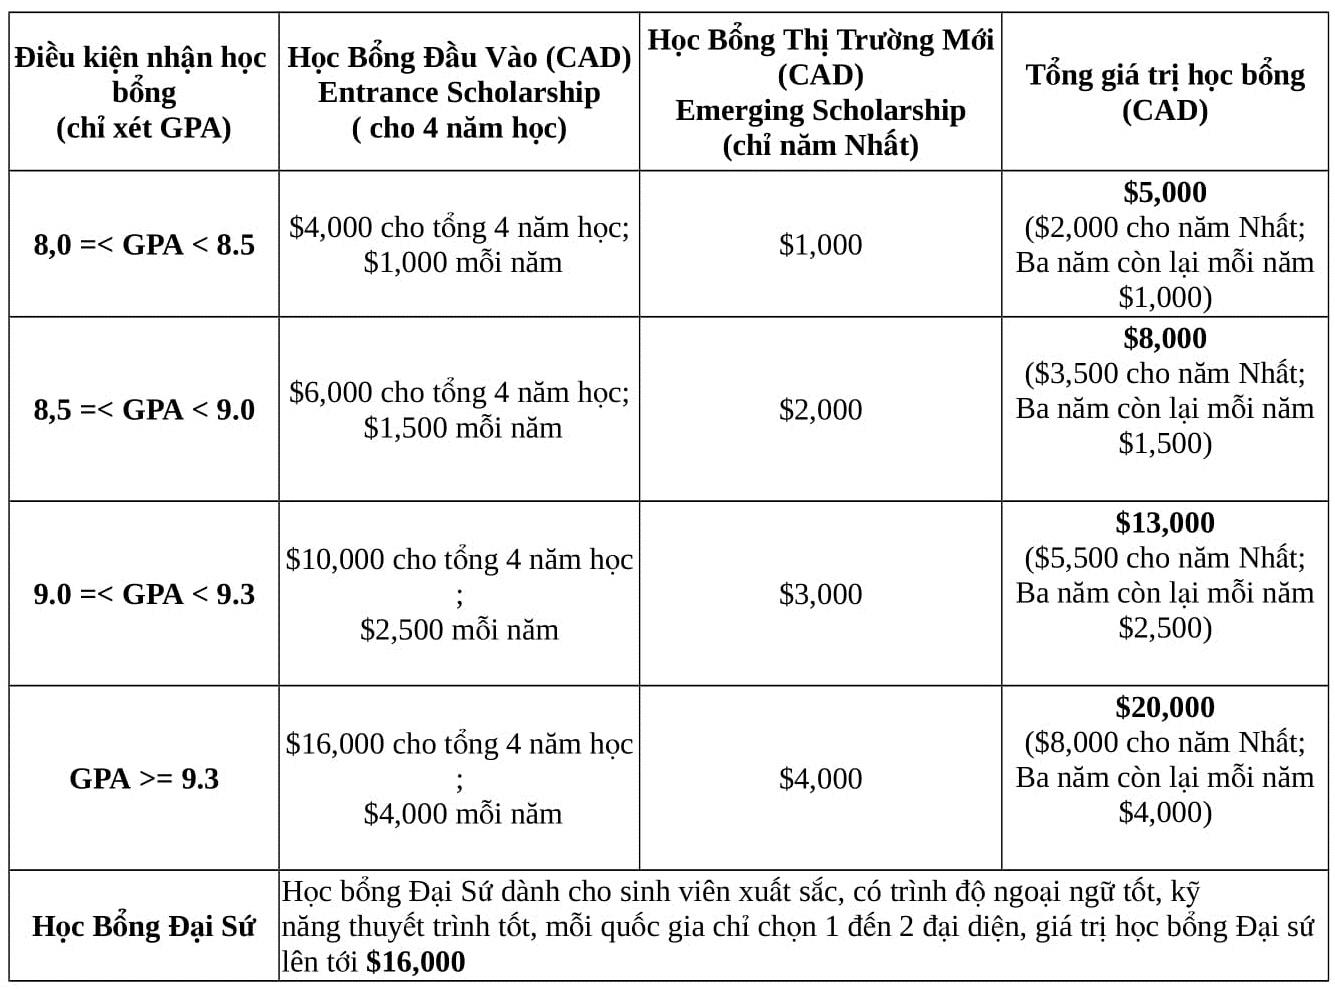 HOC BONG DAI HOC BROCK - TORONTO - CANADA 1 (pdf.io)-1